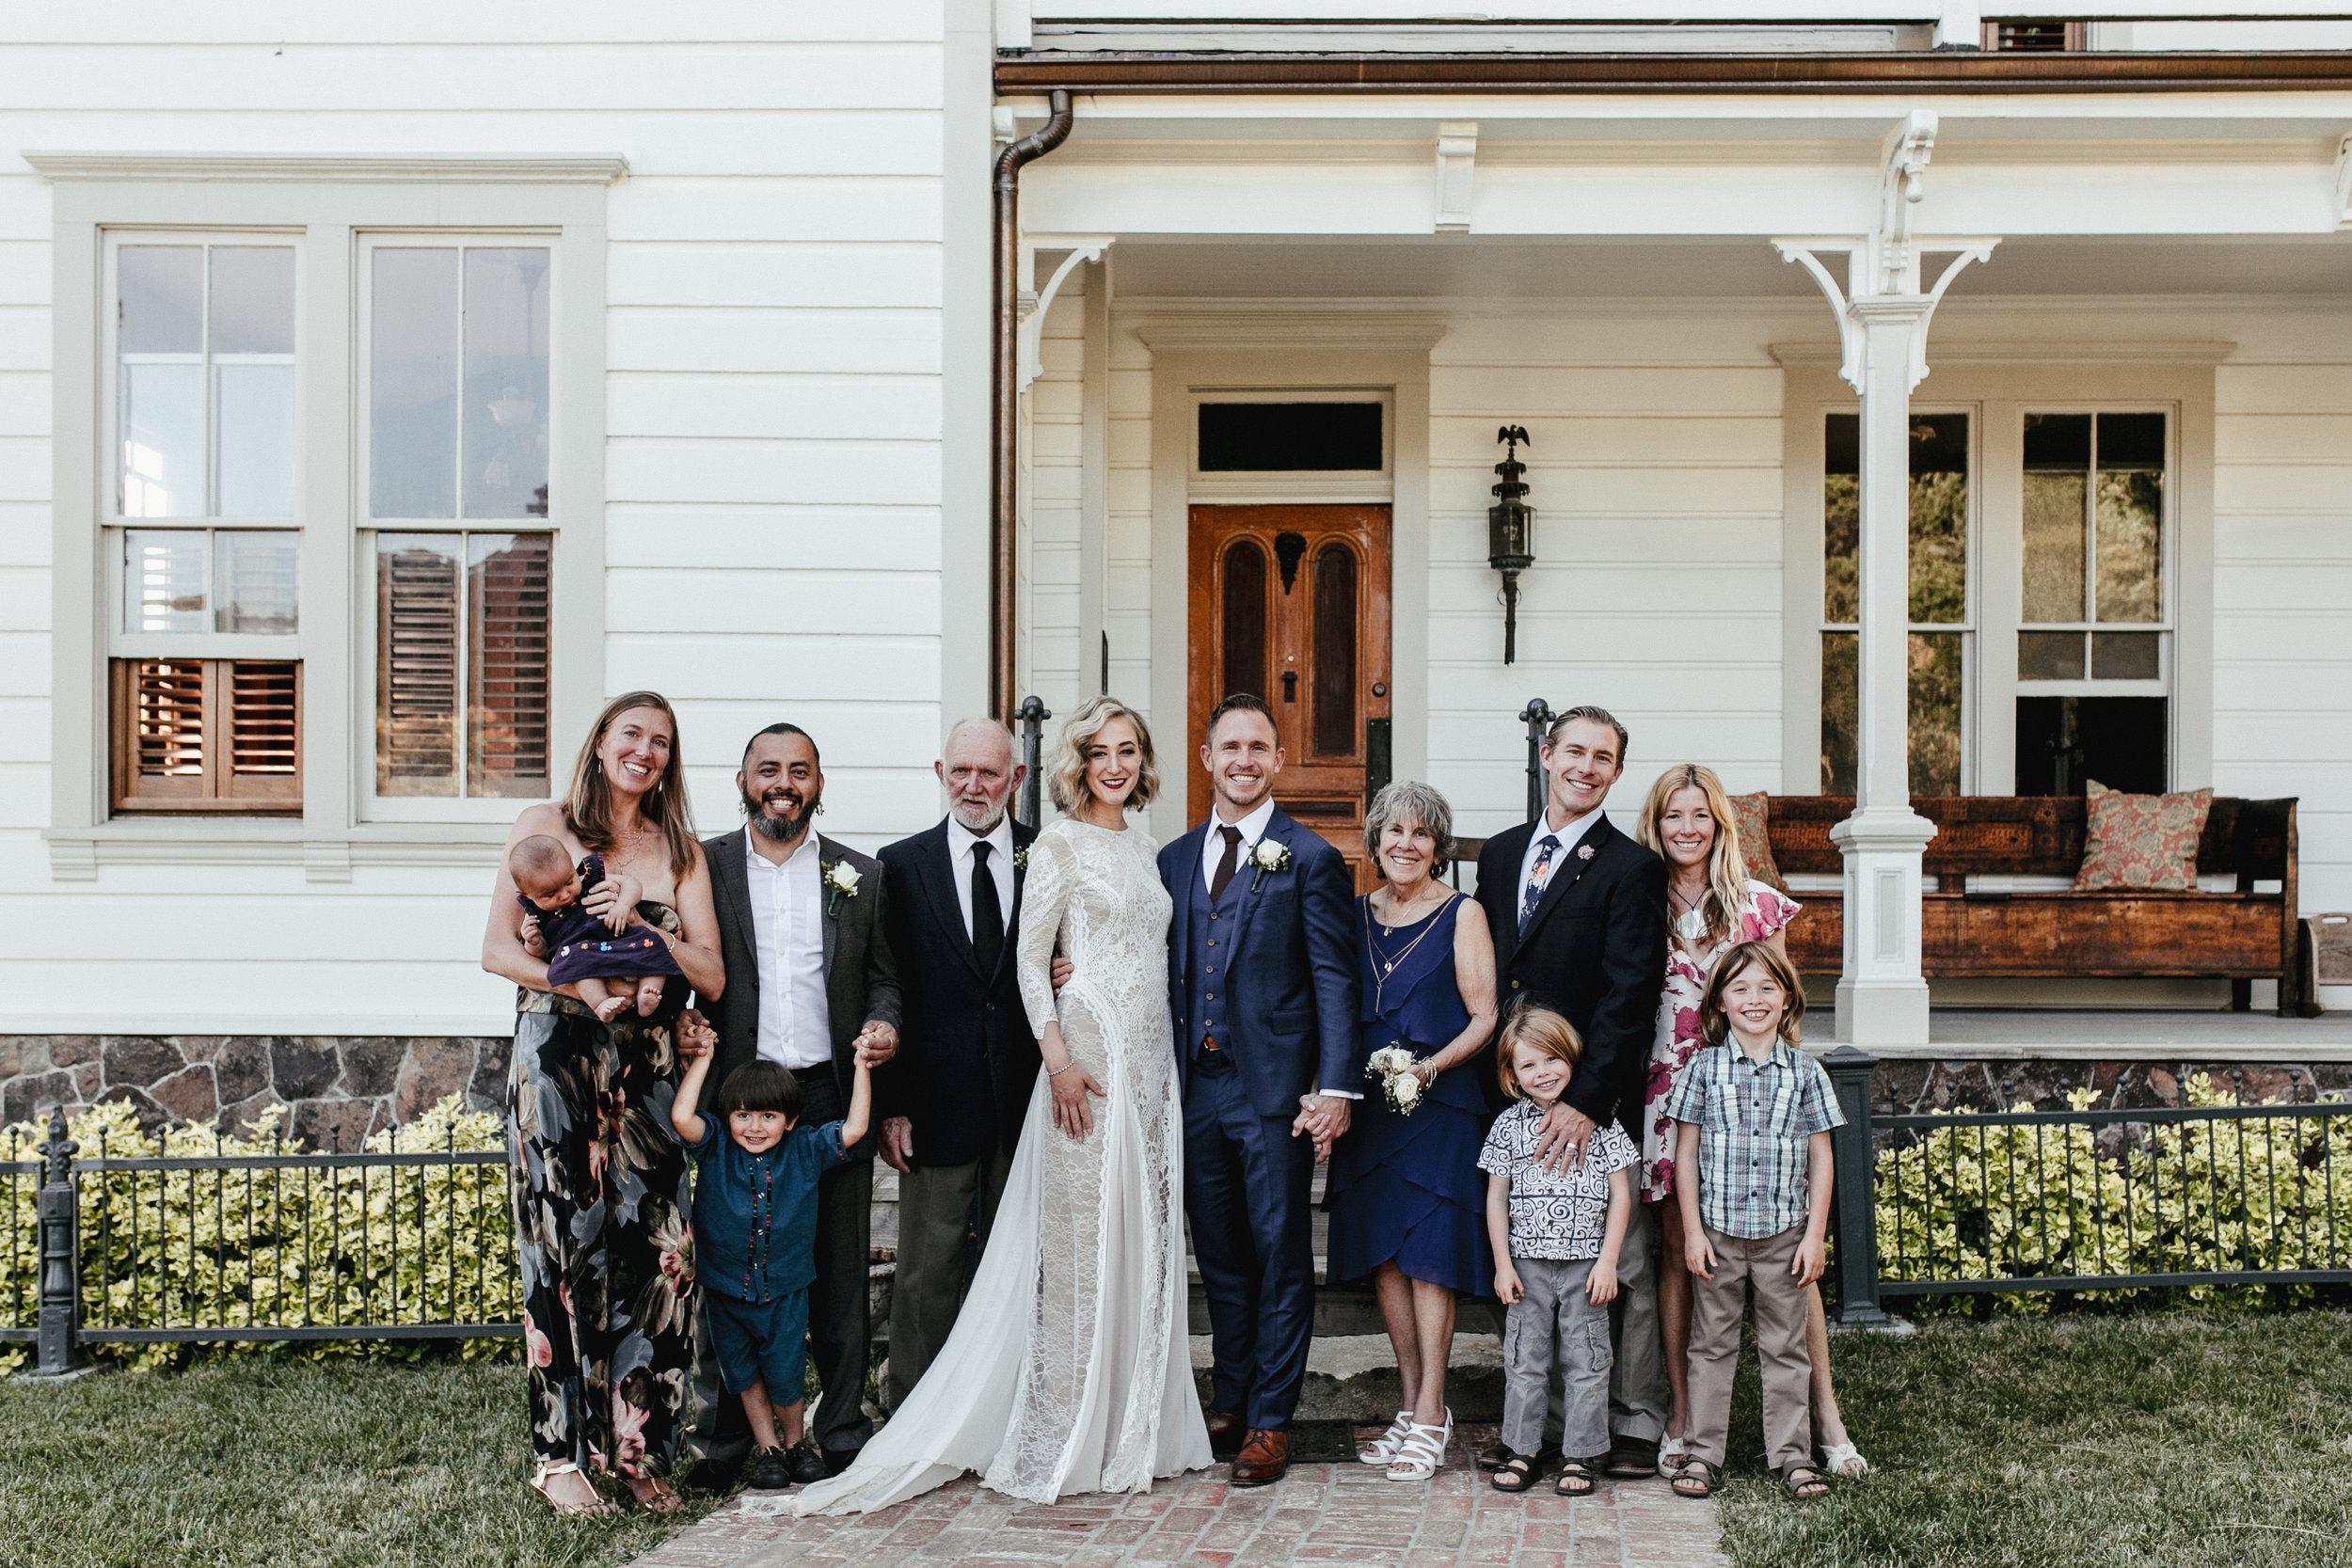 180527_JKM_Paula_Brian_Wedding_Final-10359.jpg